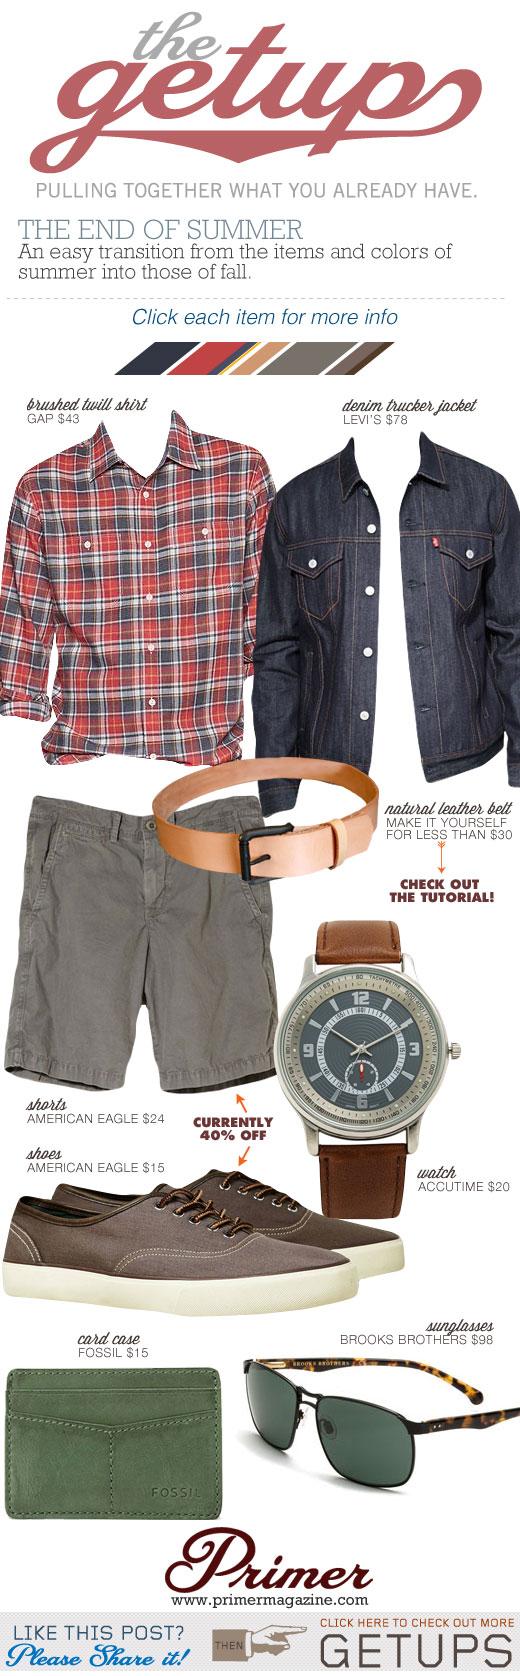 Getup End of Summer - Denim trucker jacket, red plad shirt, gray shorts, tan belt